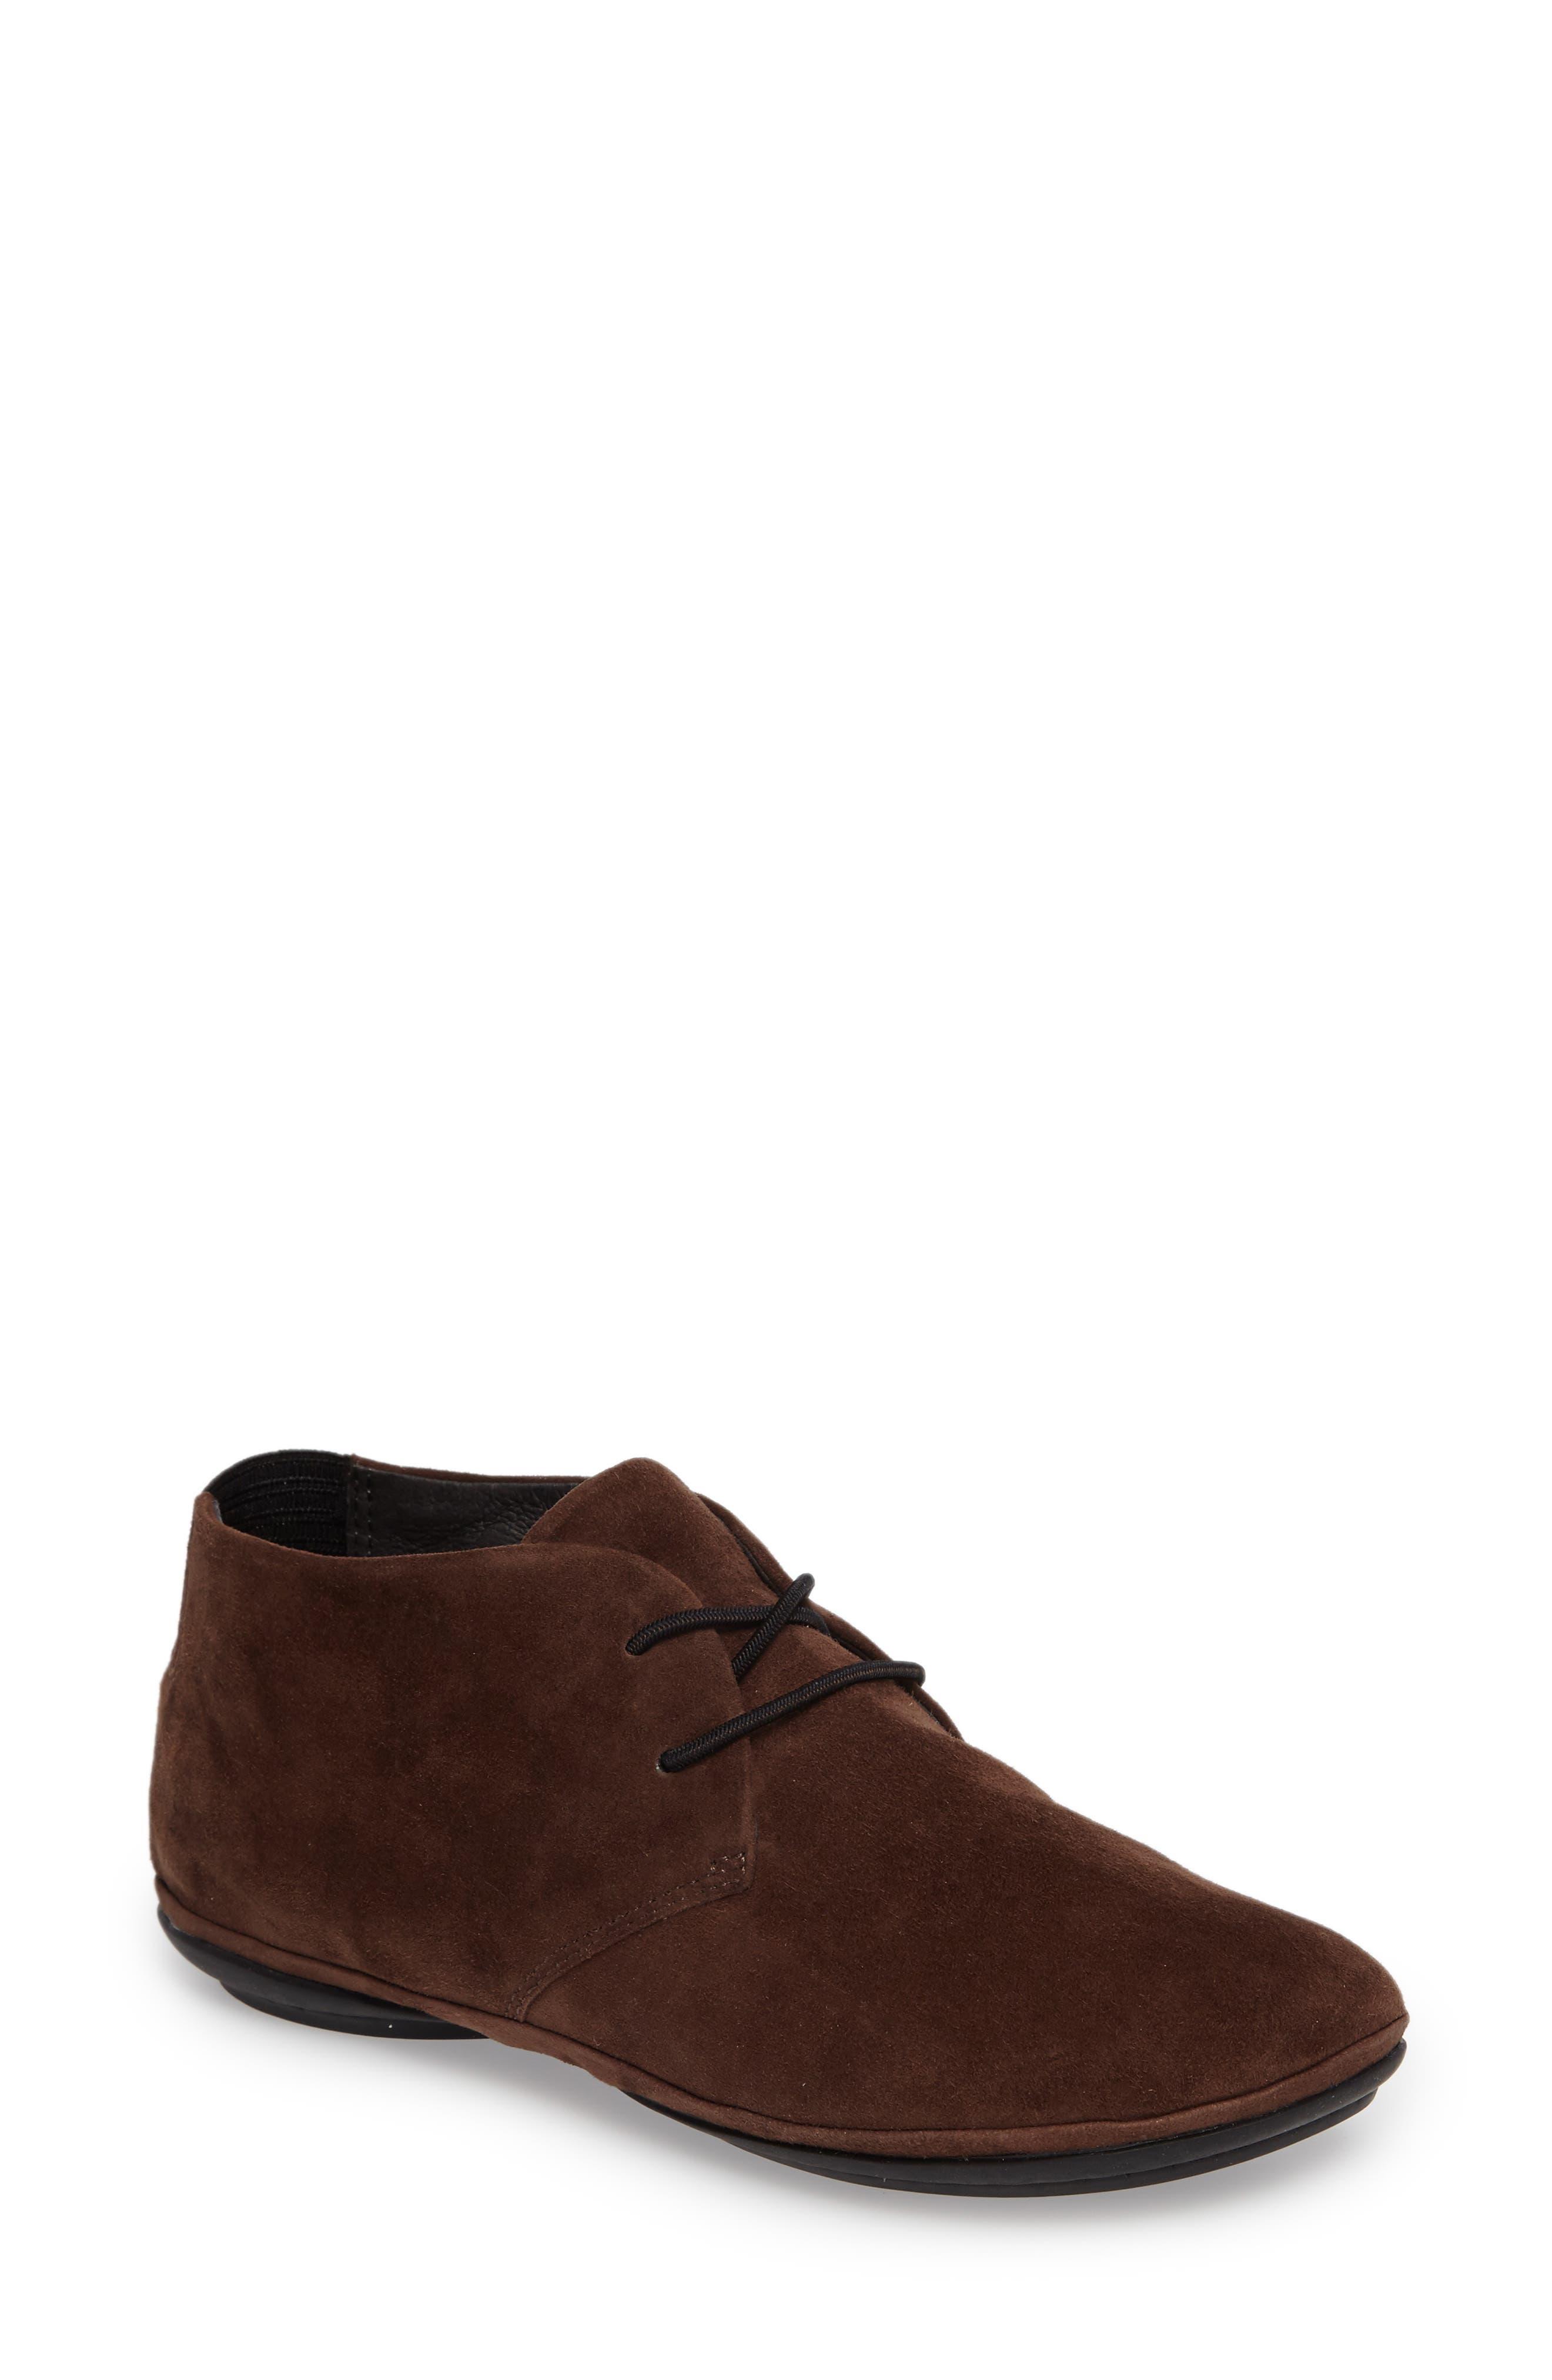 Right Nina Desert Shoe,                             Main thumbnail 1, color,                             Medium Brown Leather